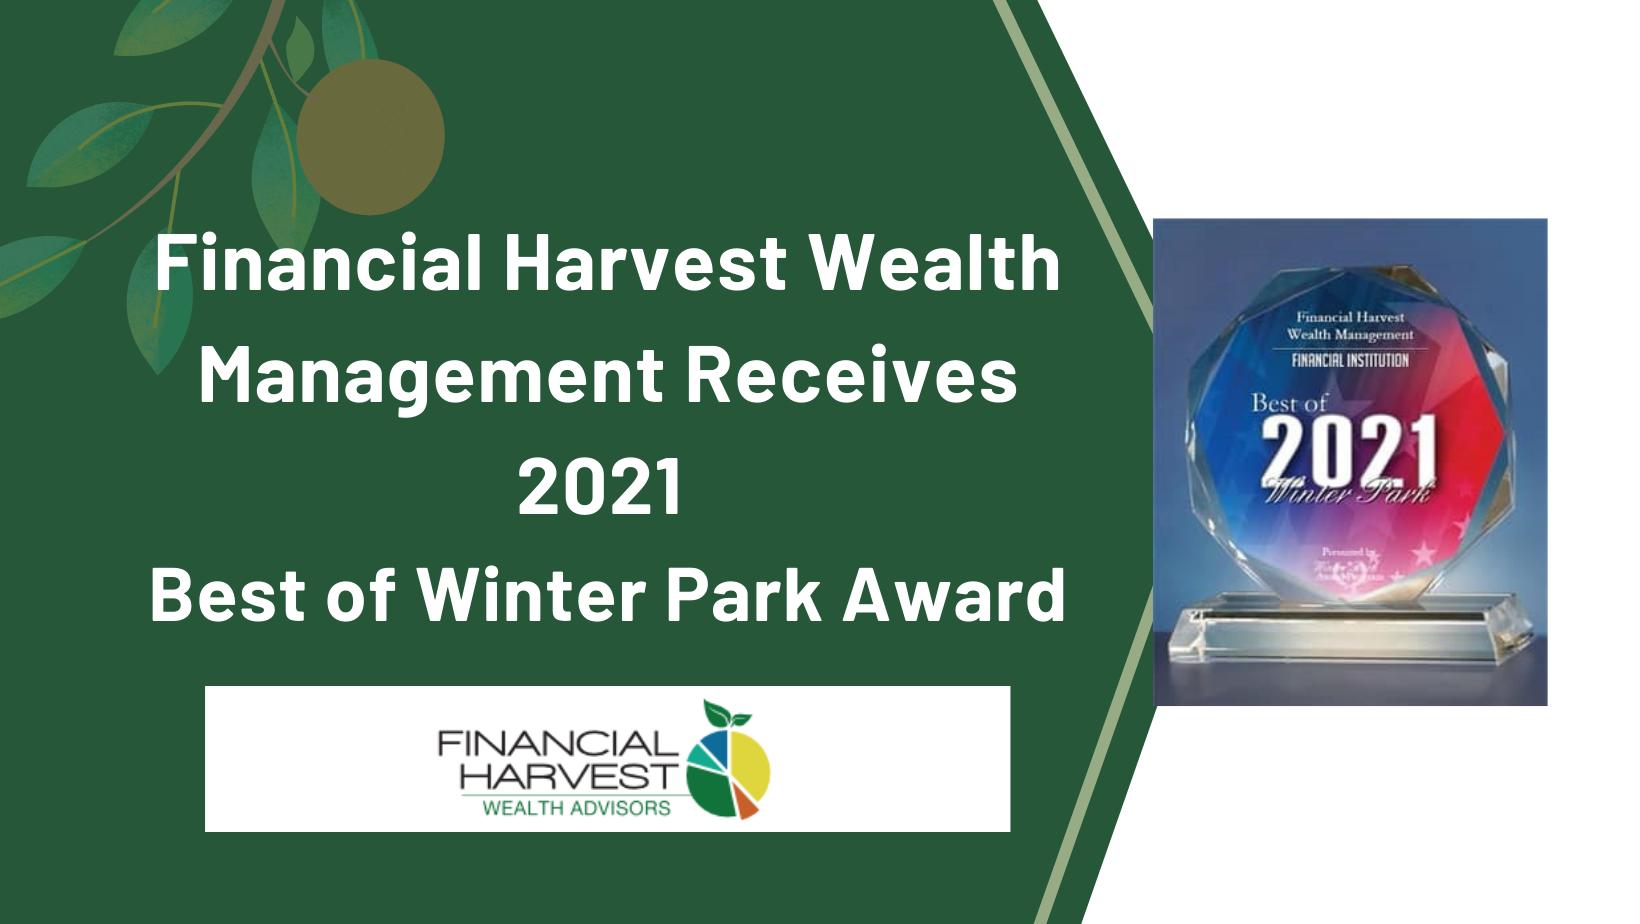 Financial harvest wealth management receives 2021 best of winter park award